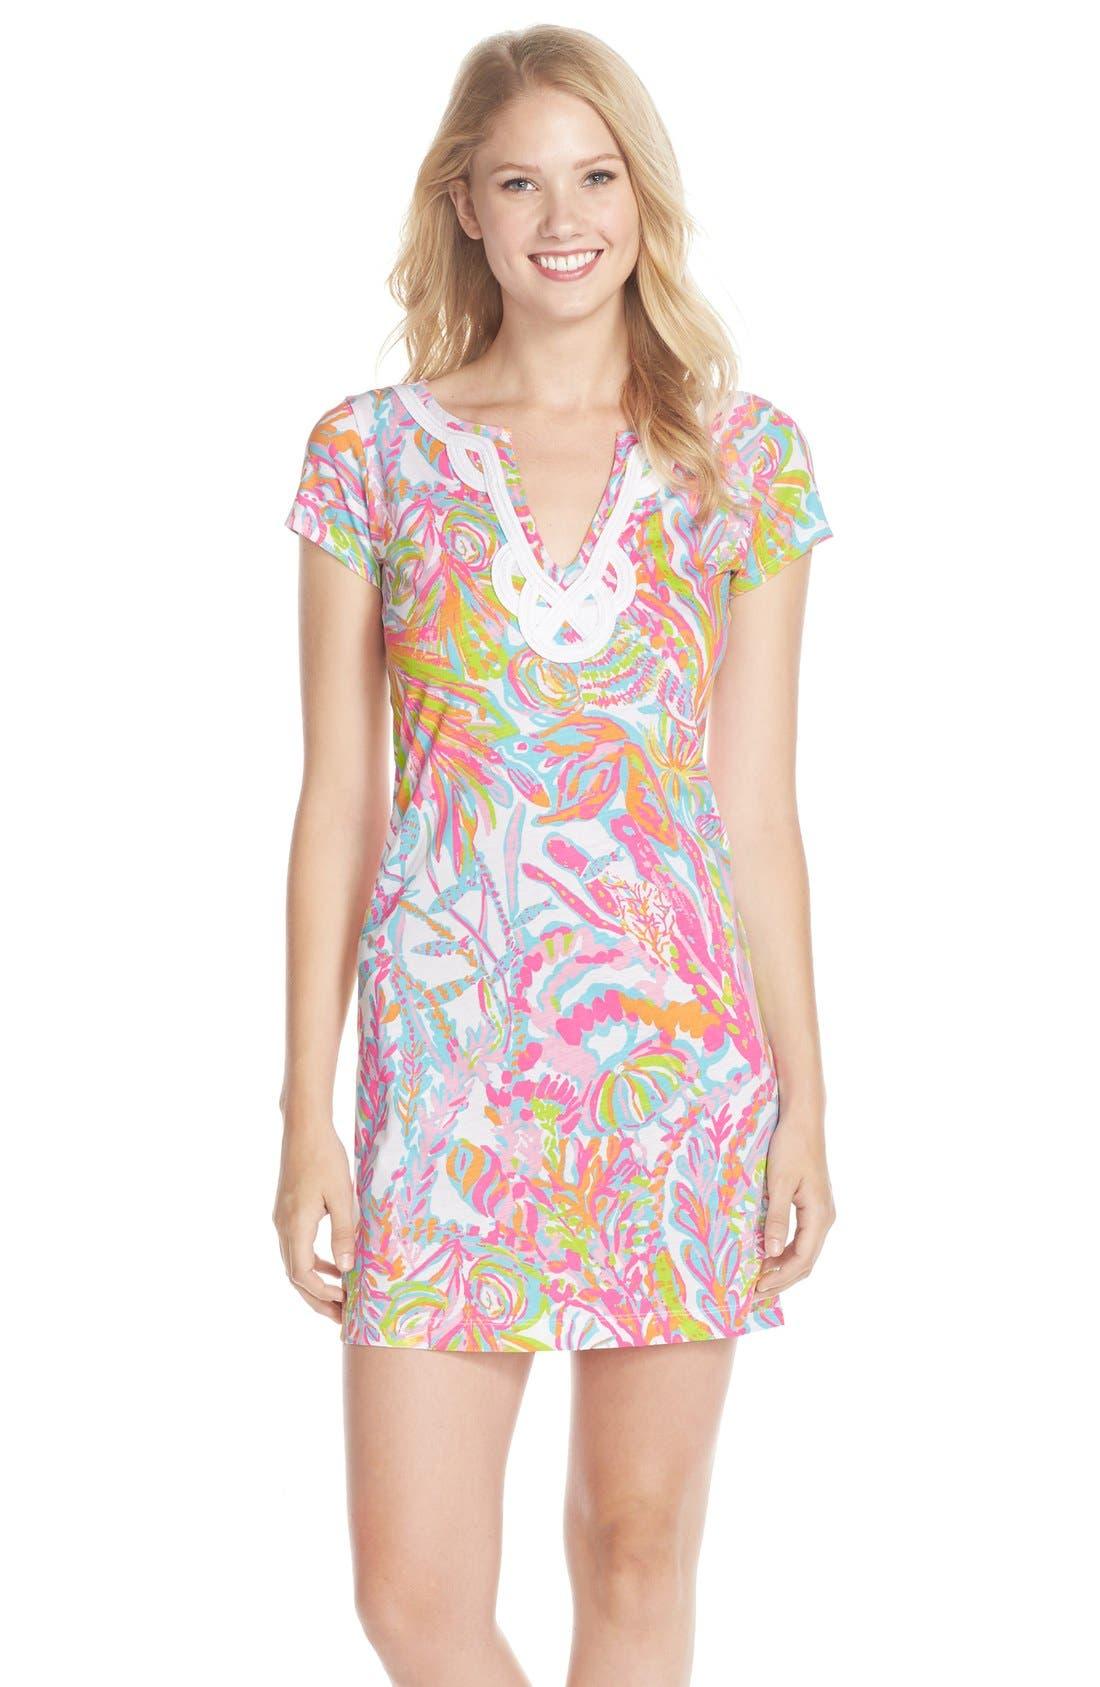 Main Image - Lilly Pulitzer® 'Brewster' Contrast Trim Print T-Shirt Dress